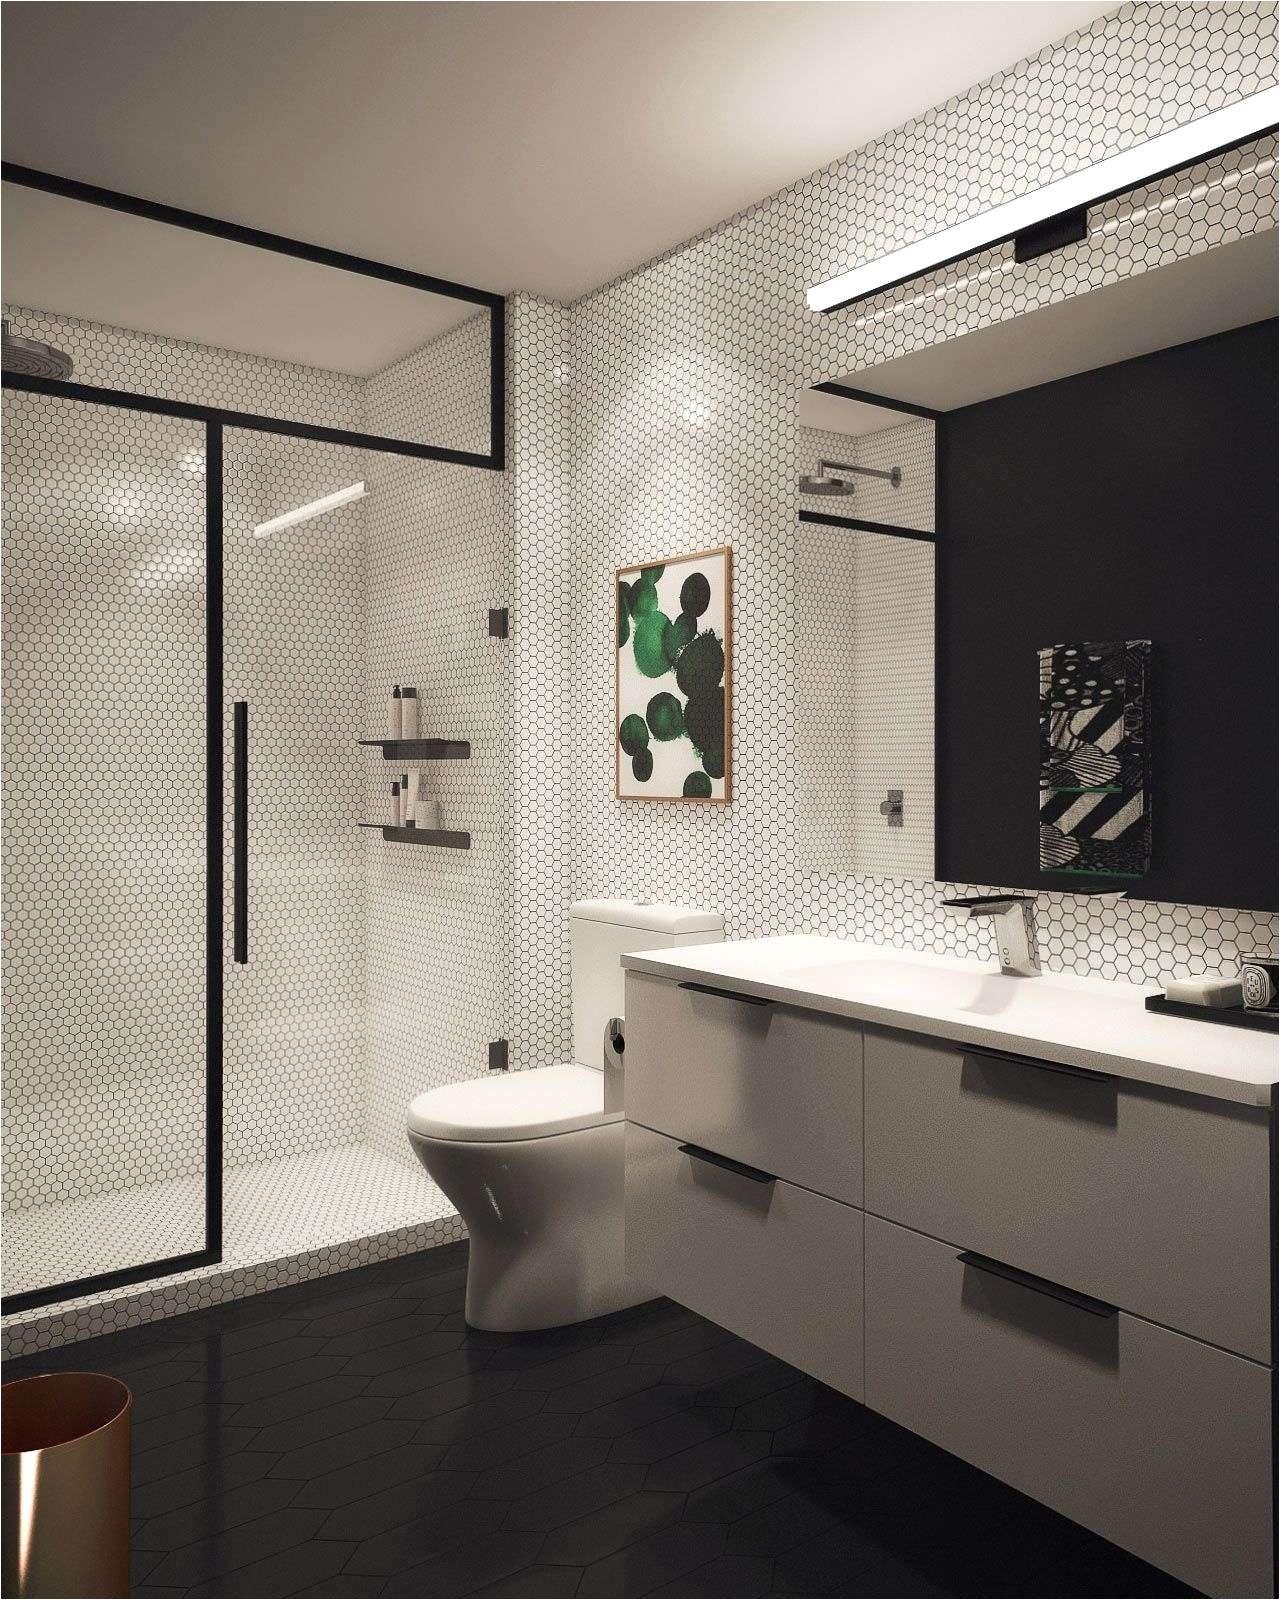 Tiles for Small Bathroom Design Ideas Magnificent Bathroom Wall Tile Ideas for Small Bathrooms Lovely